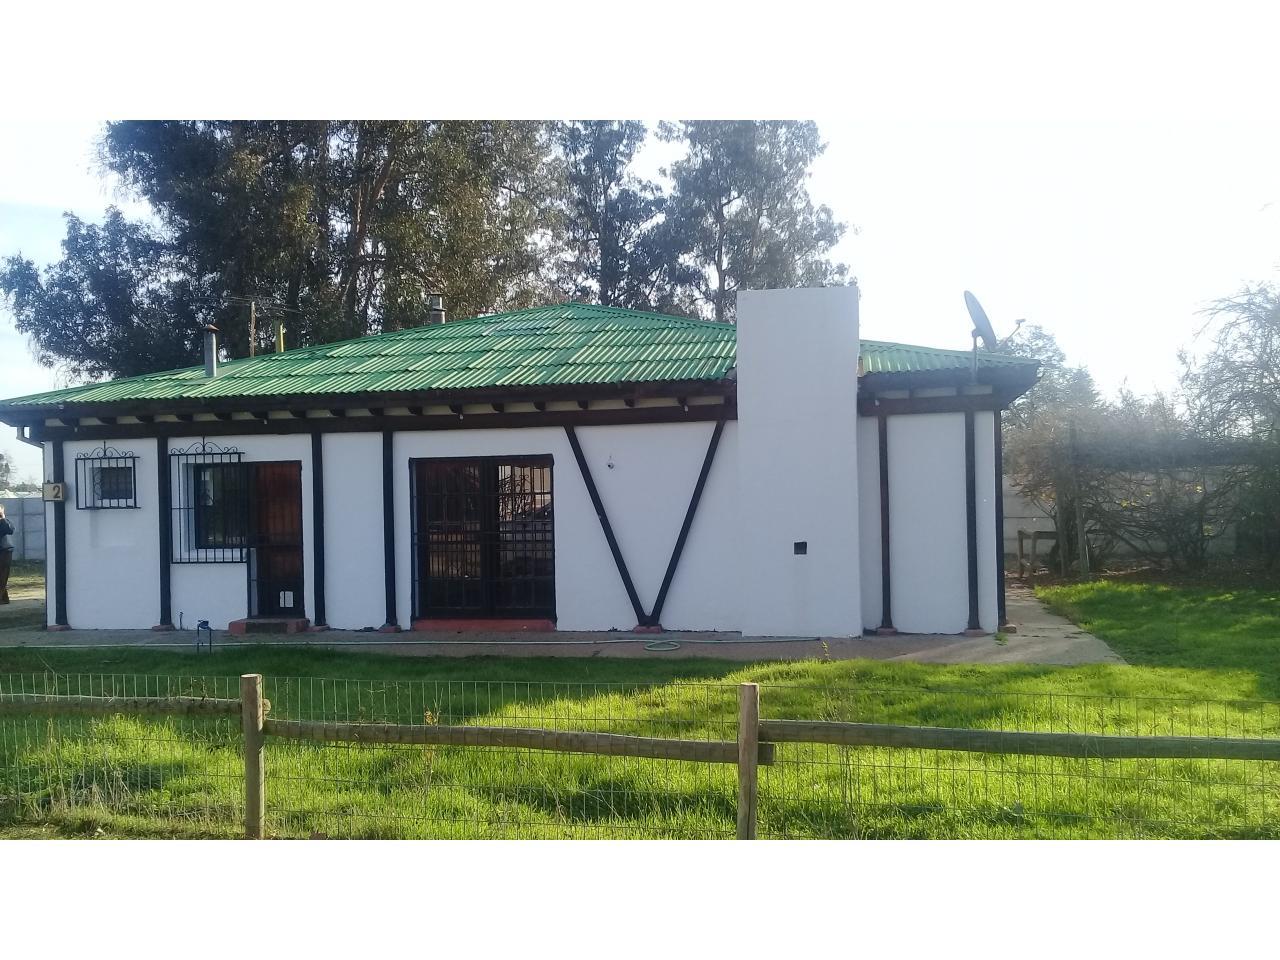 Casa en arriendo en limache goplaceit for Arriendo de casas